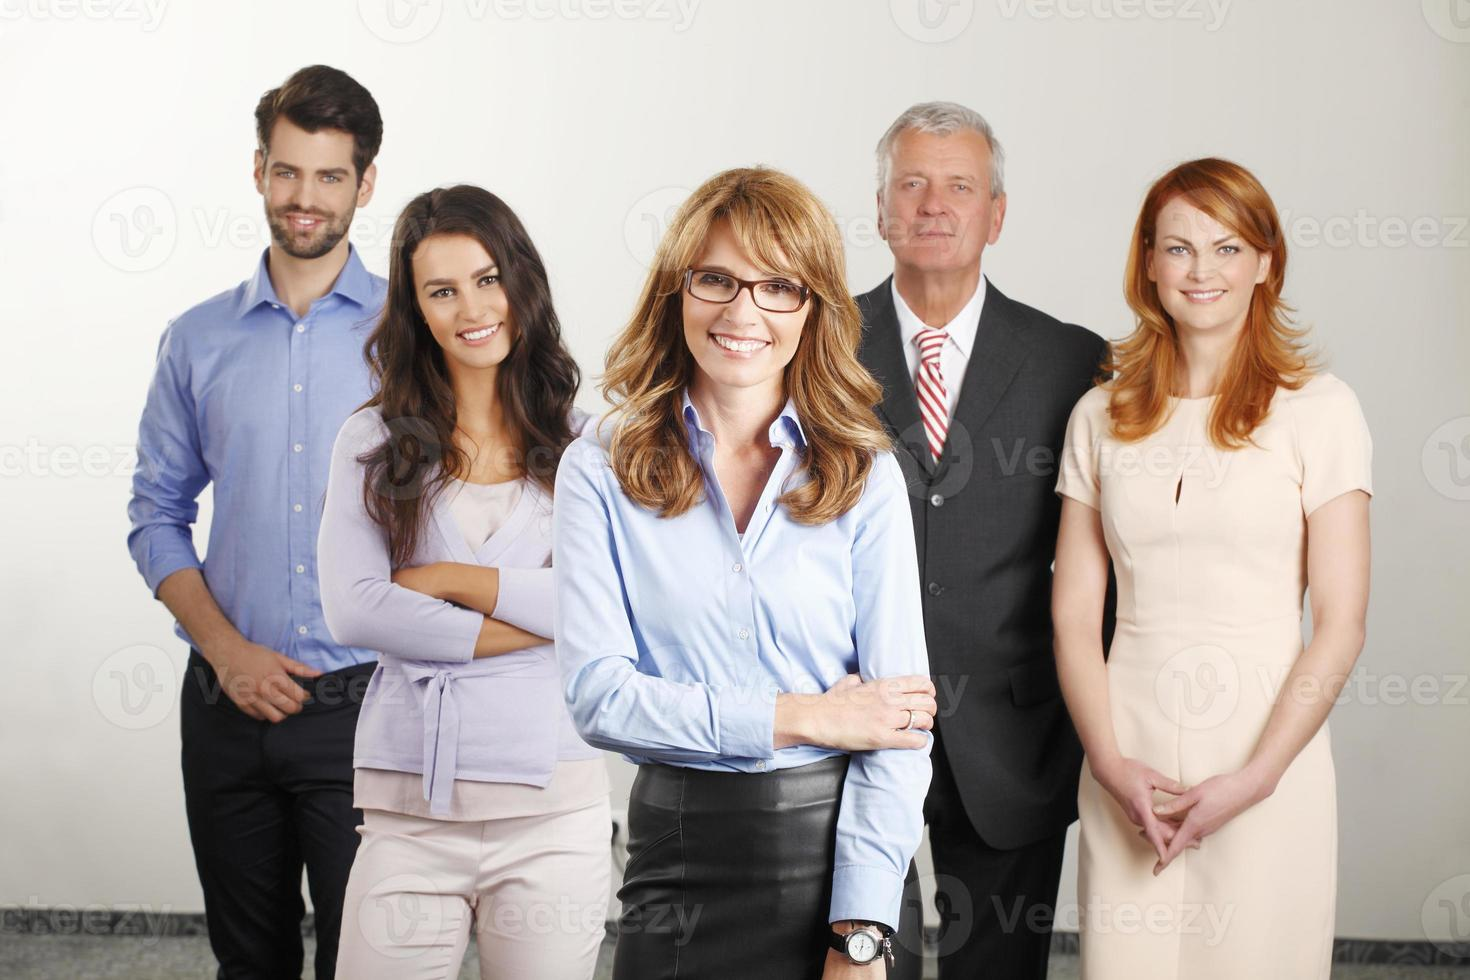 grupo empresarial foto